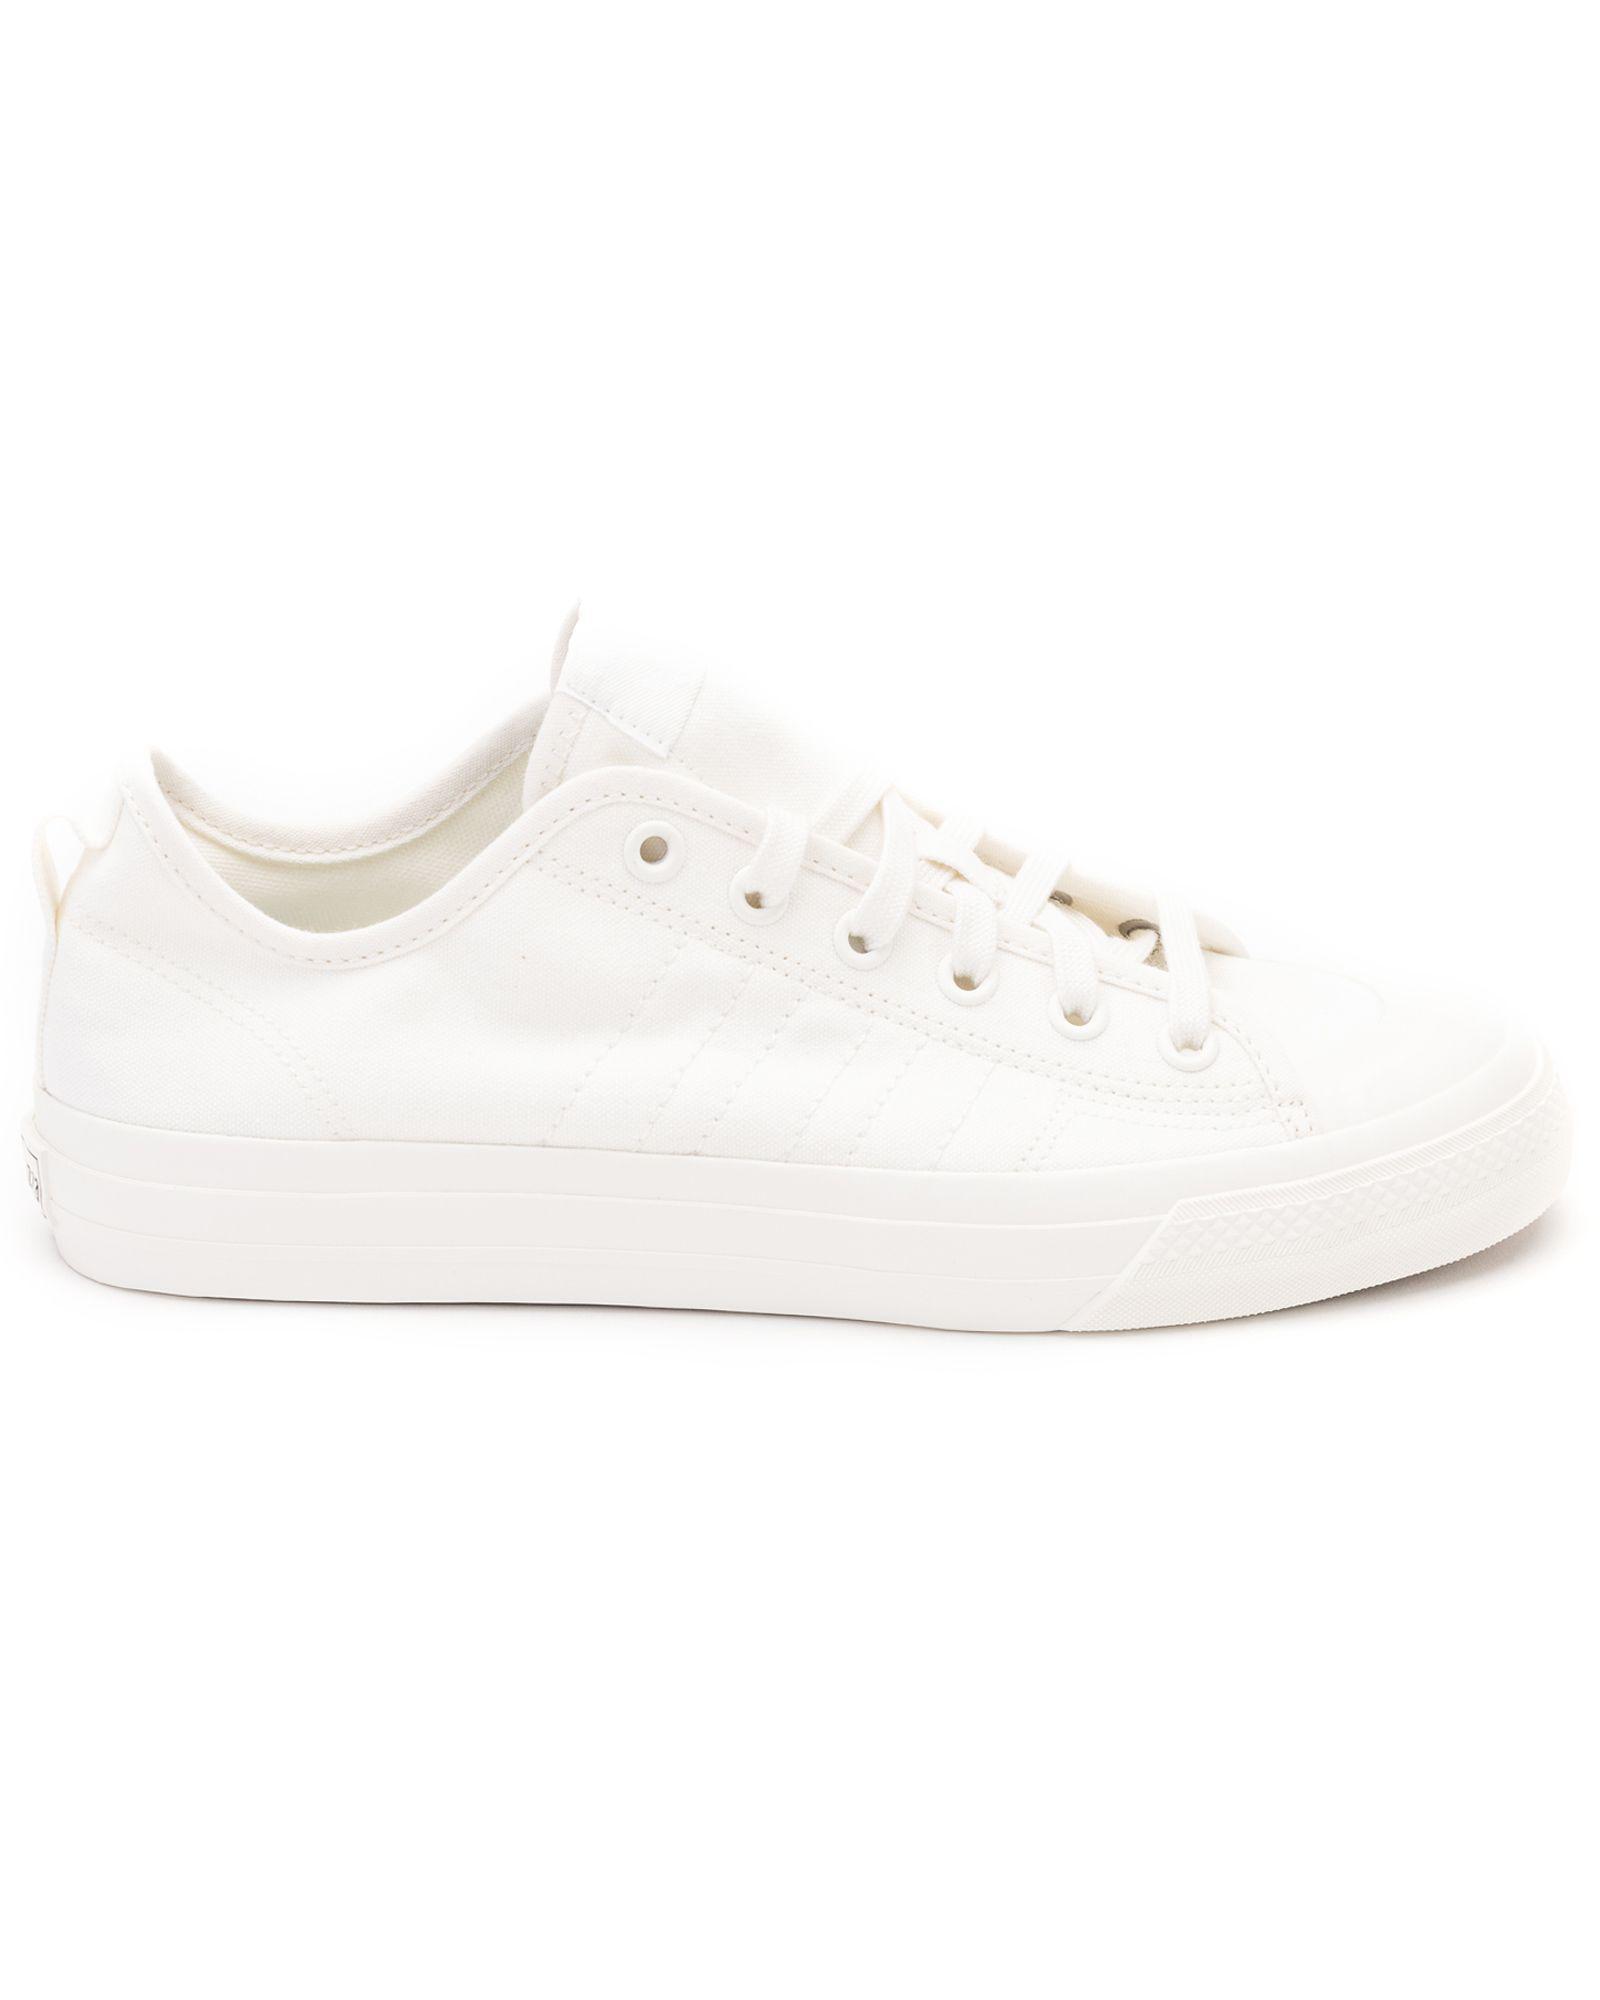 Adidas Originals Nizza Rf Canvas Sneakers In White | ModeSens